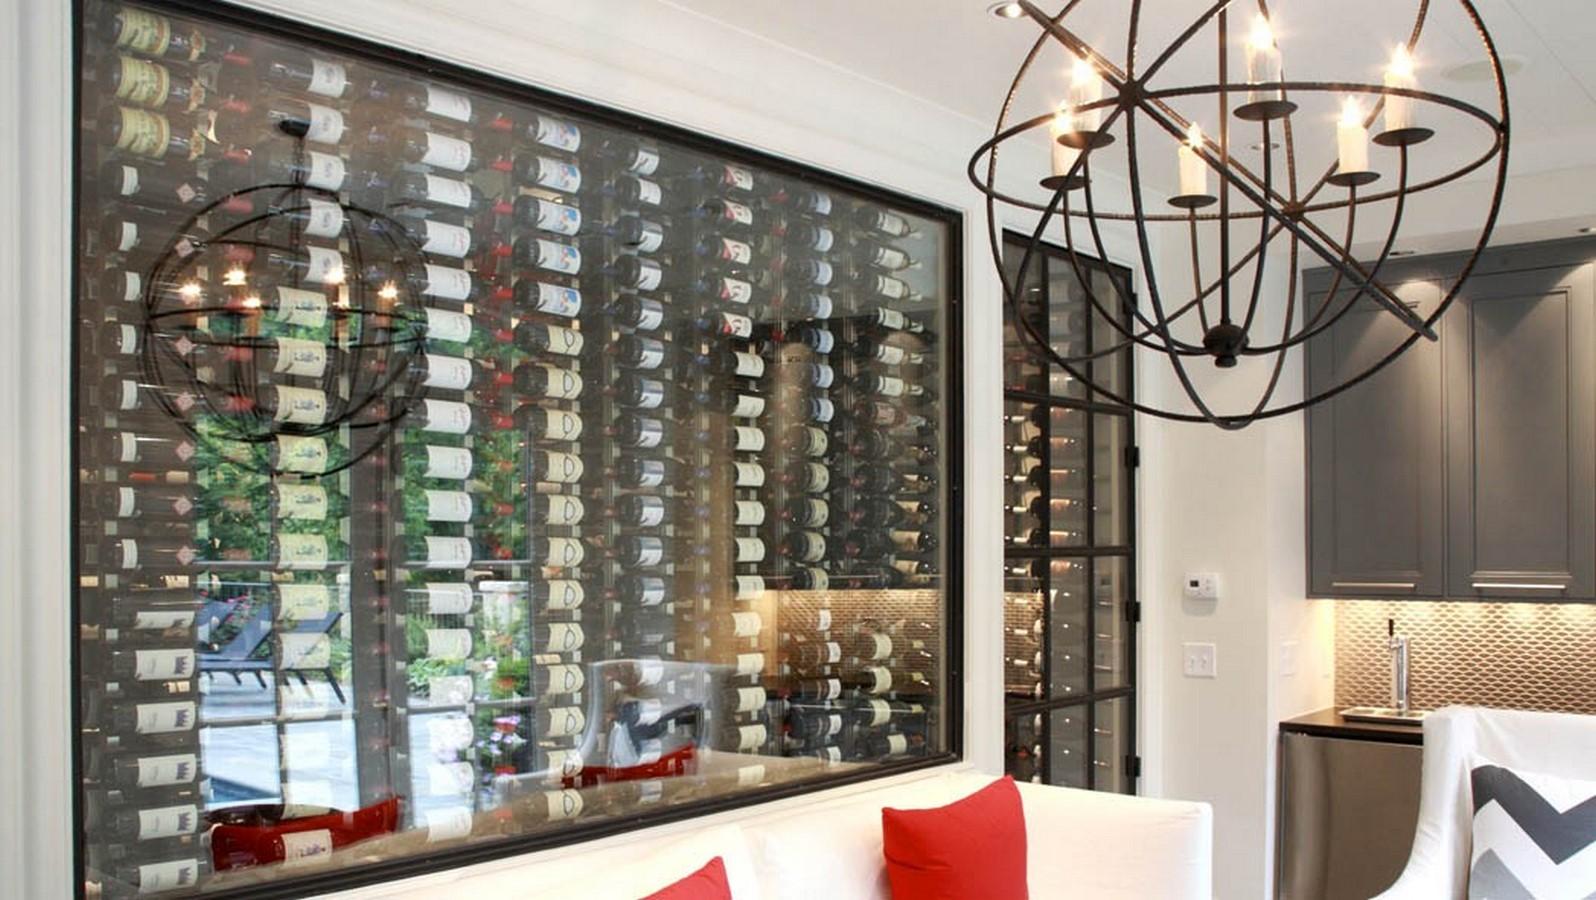 10 wine cellar design people should invest in - Sheet4